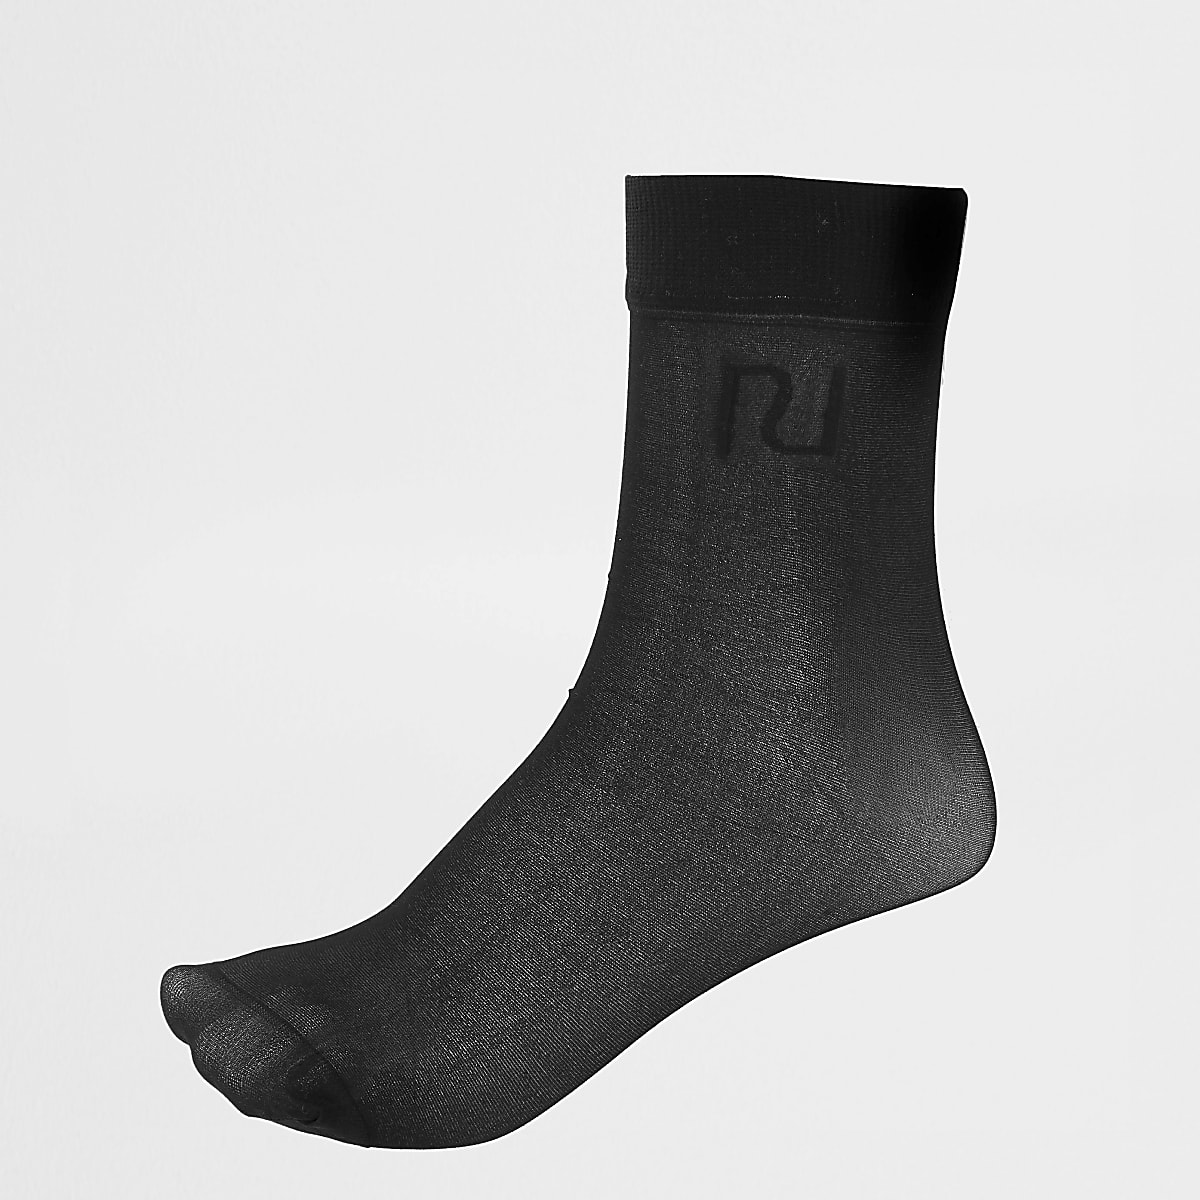 Zwarte doorschijnende RI-sokken